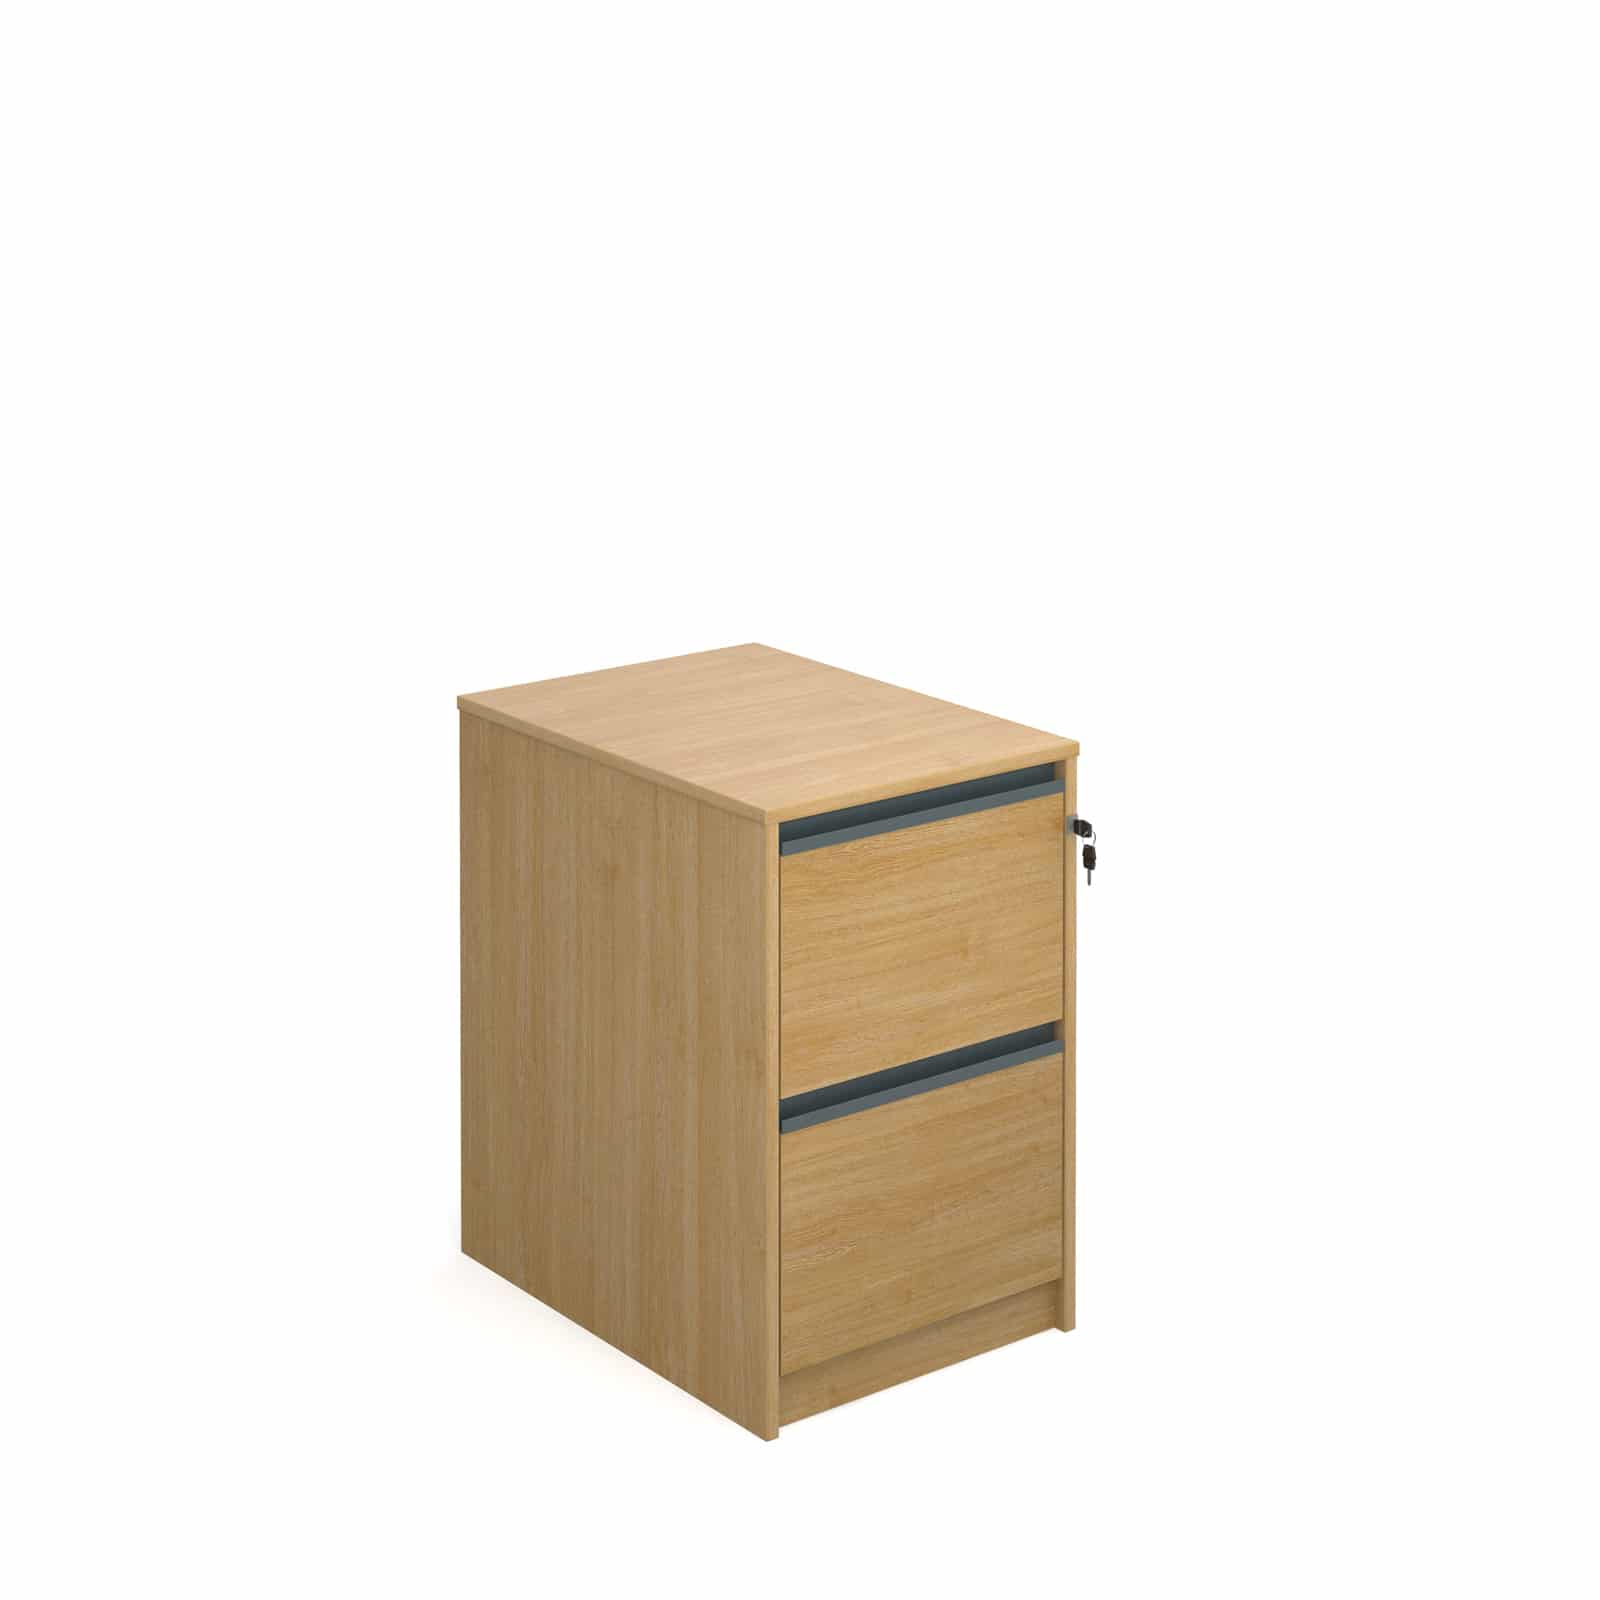 Universal Ready Built 2 Draw Wood Office Furniture Tough Filing Cabinet Oak